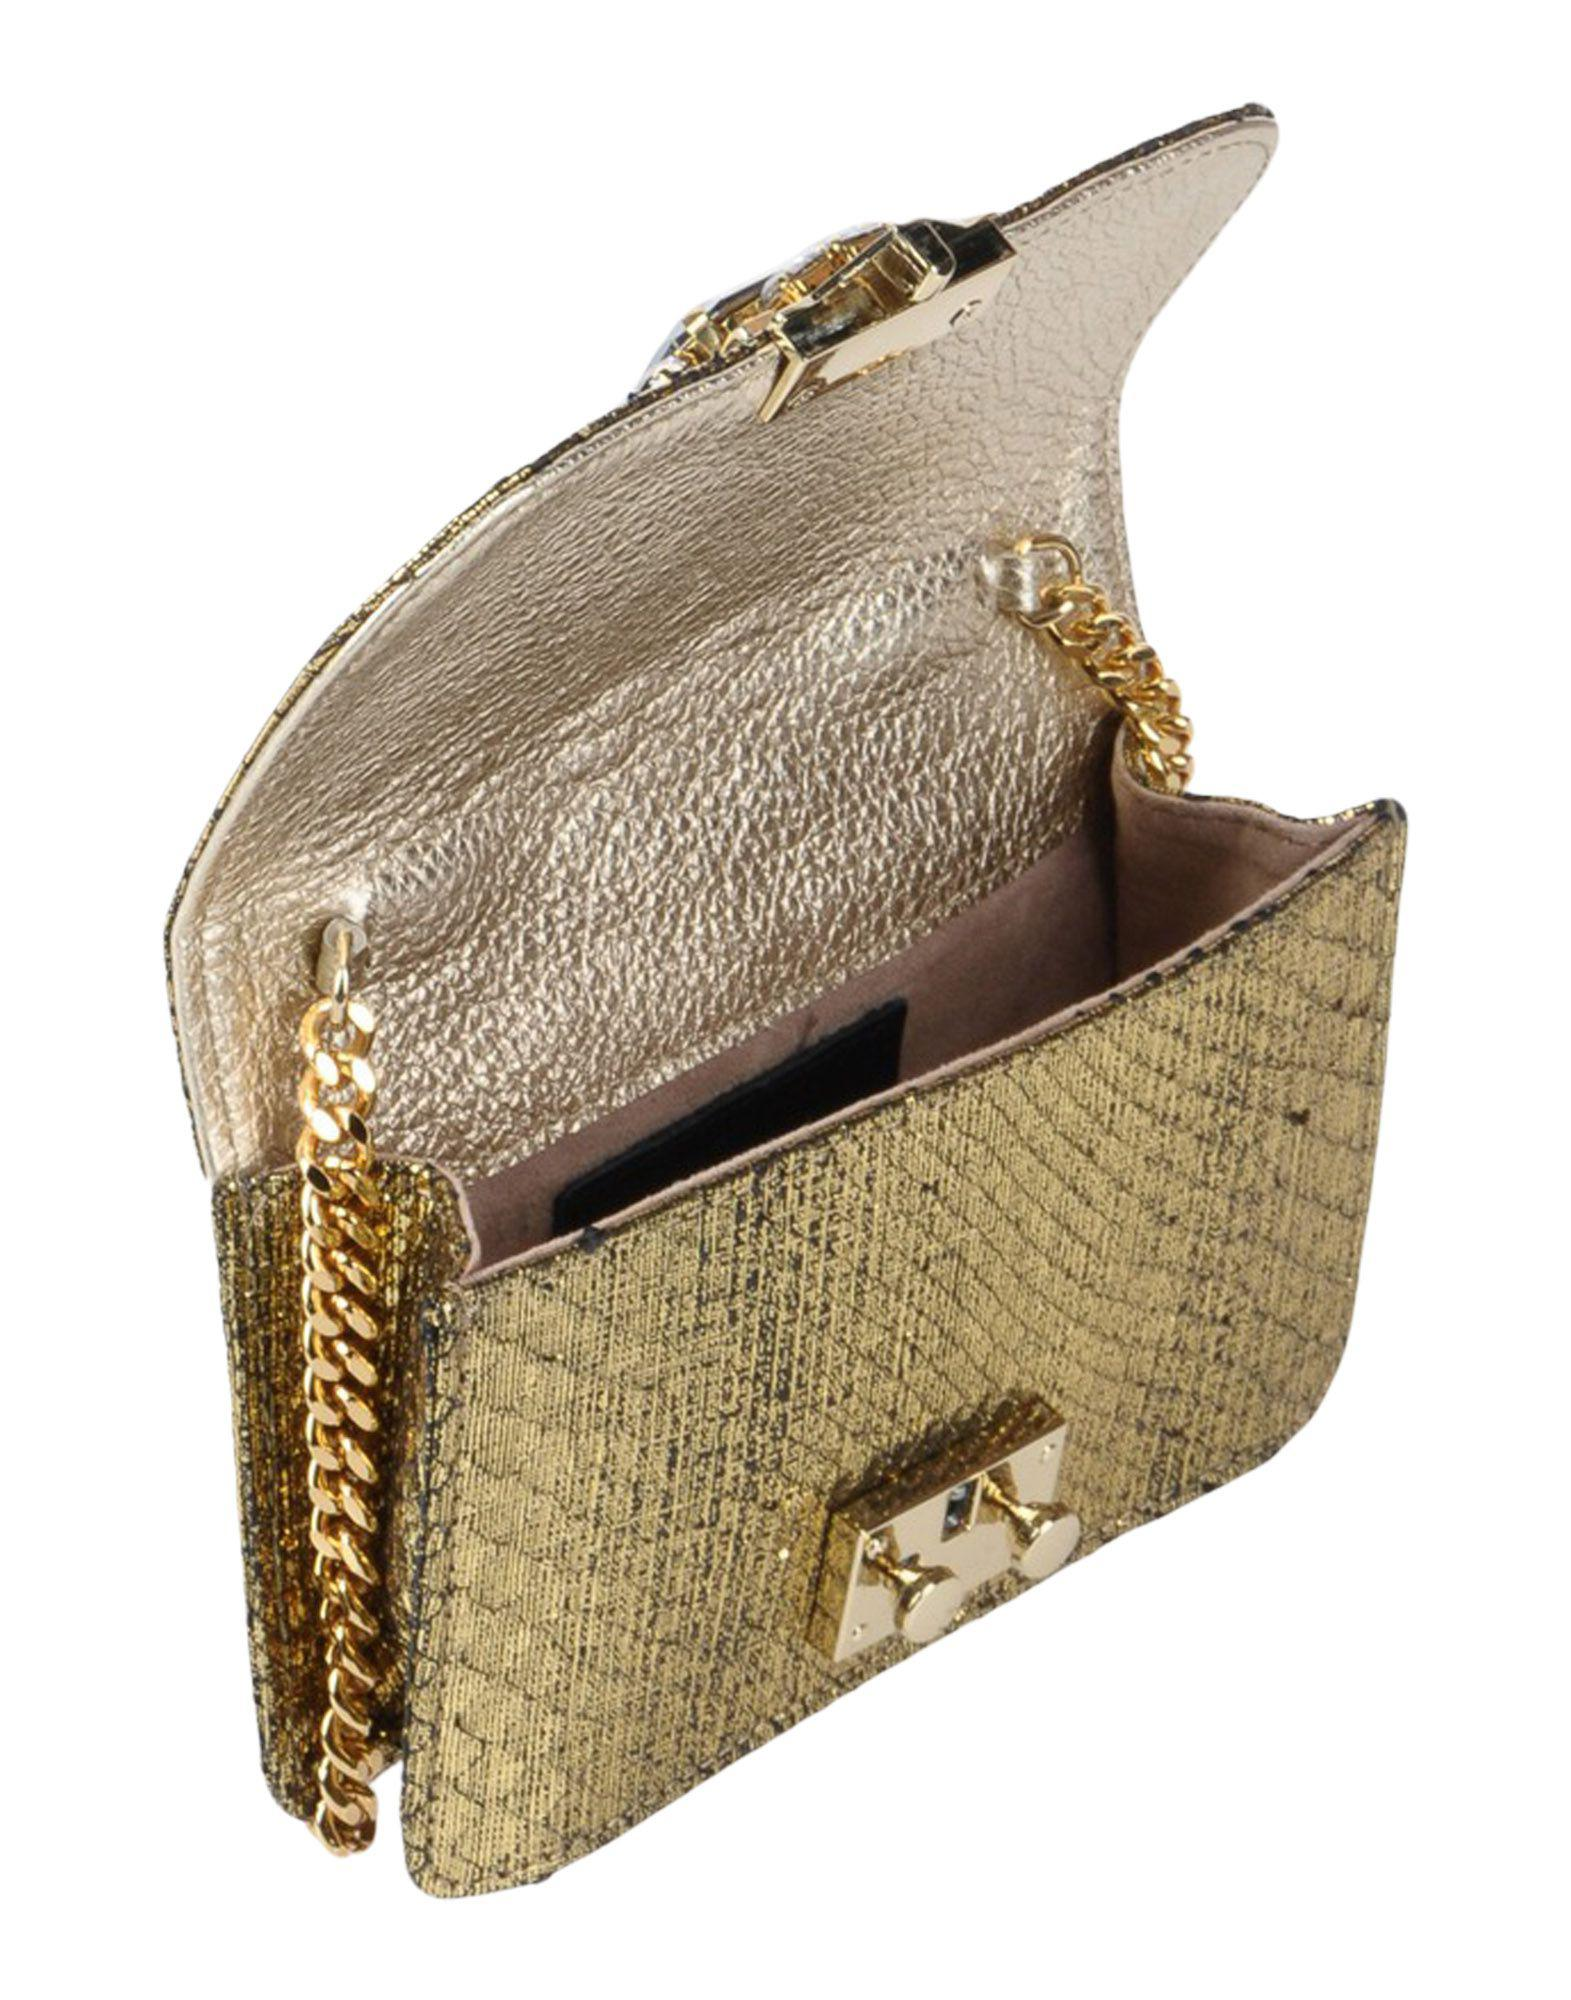 Gedebe Leather Cross-body Bag in Gold (Metallic)